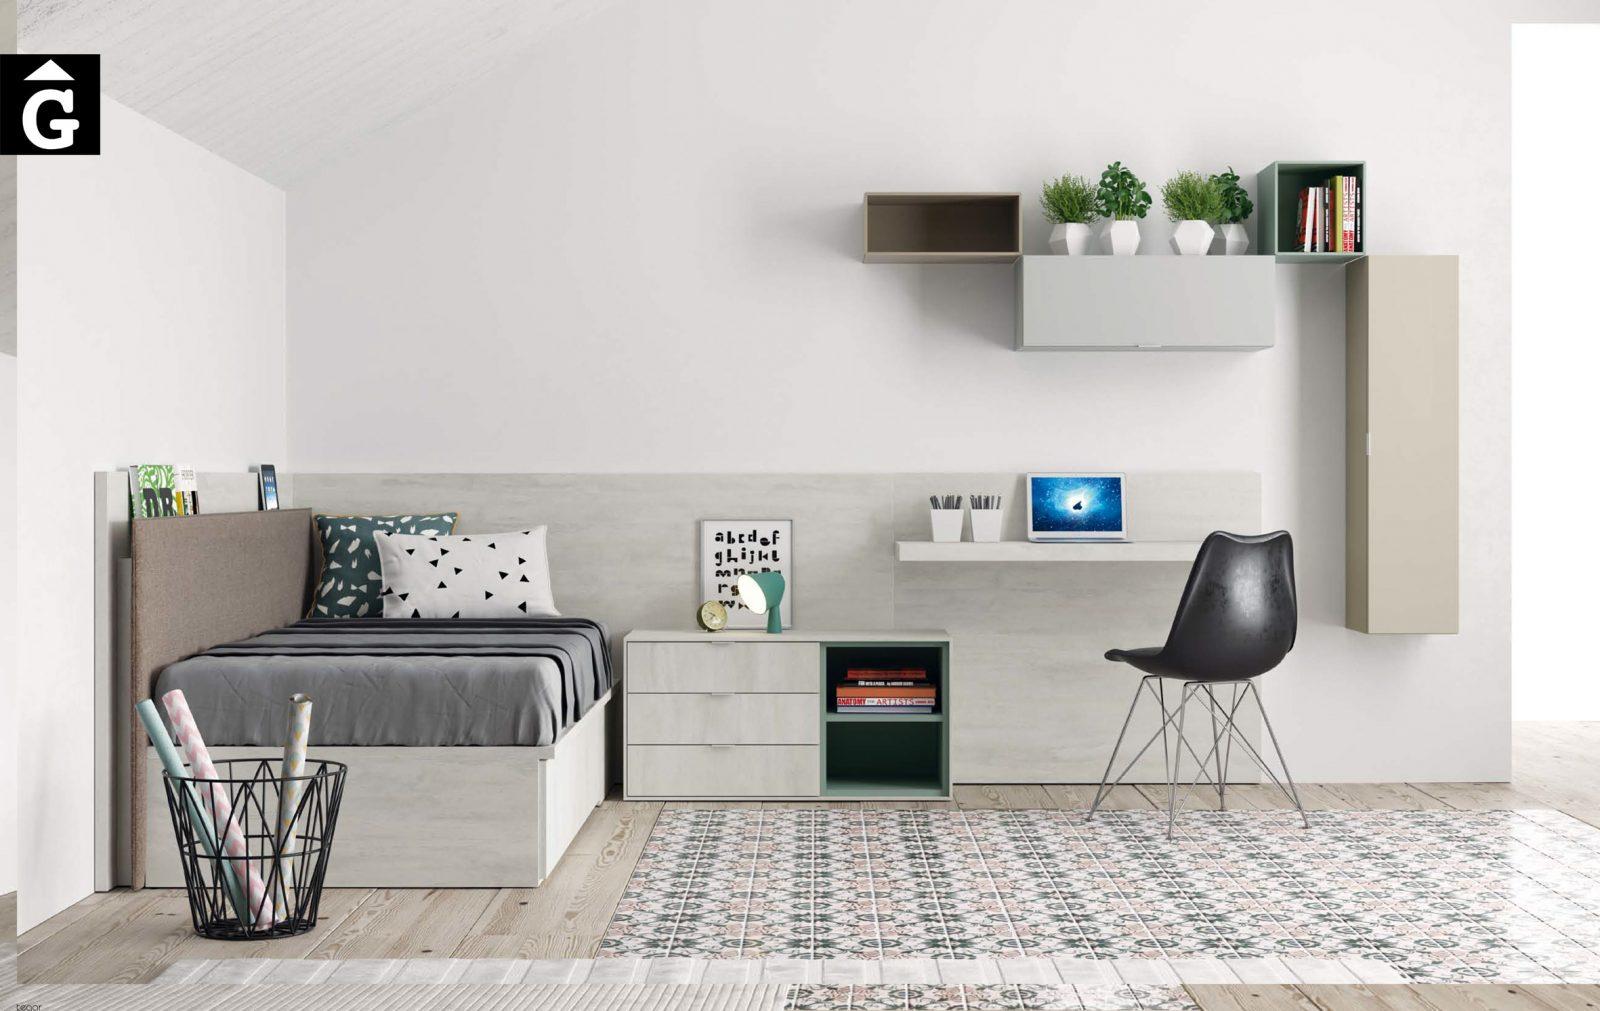 25 Habitació llit calaixos i arcó QB NEXT Tegar by nobles GIFREU Girona modern minim elegant atemporal